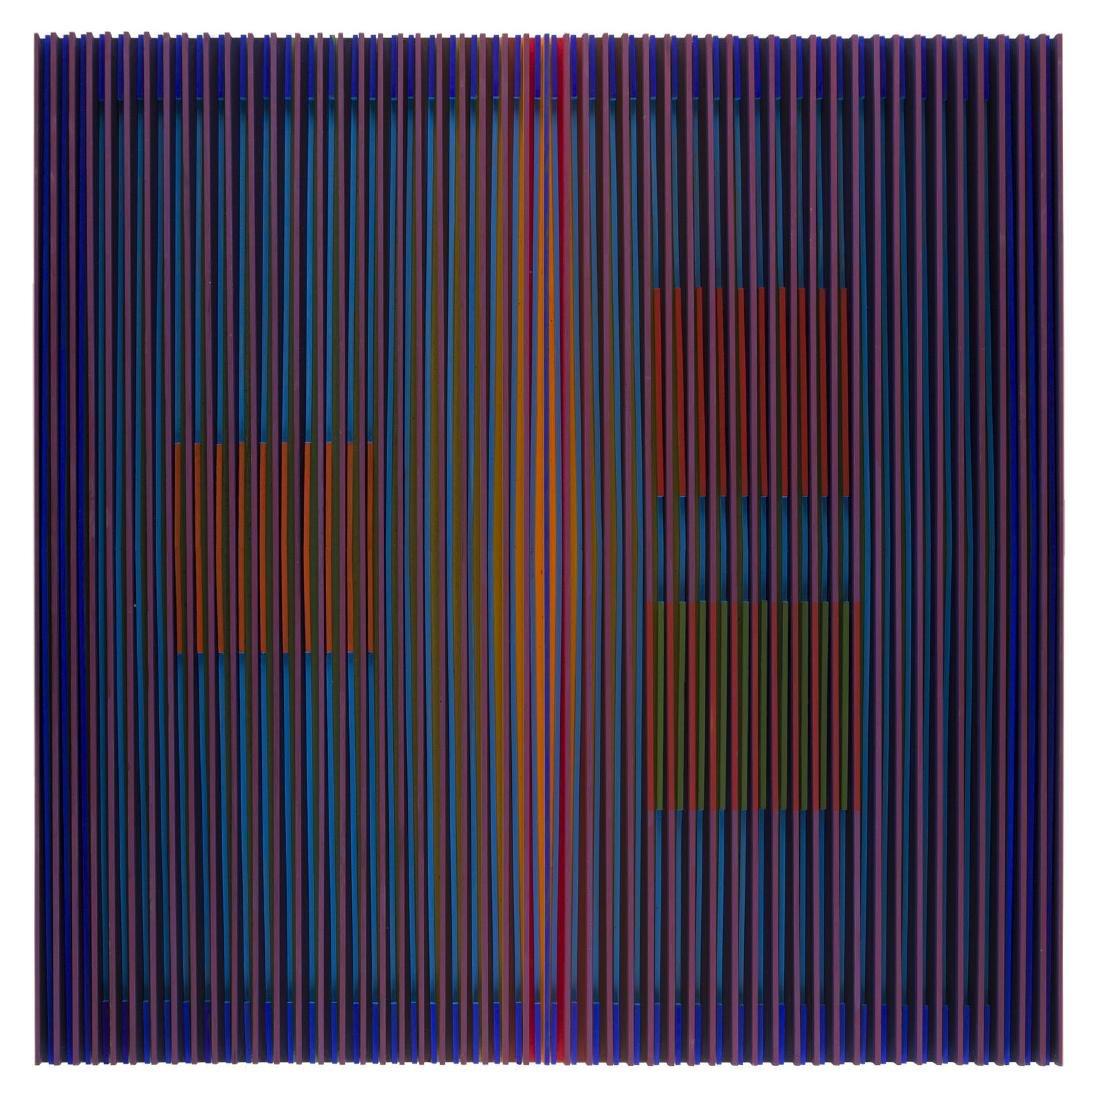 "Andrzej Nowacki (b. 1953) ""Lyrical Composition"", 2016"